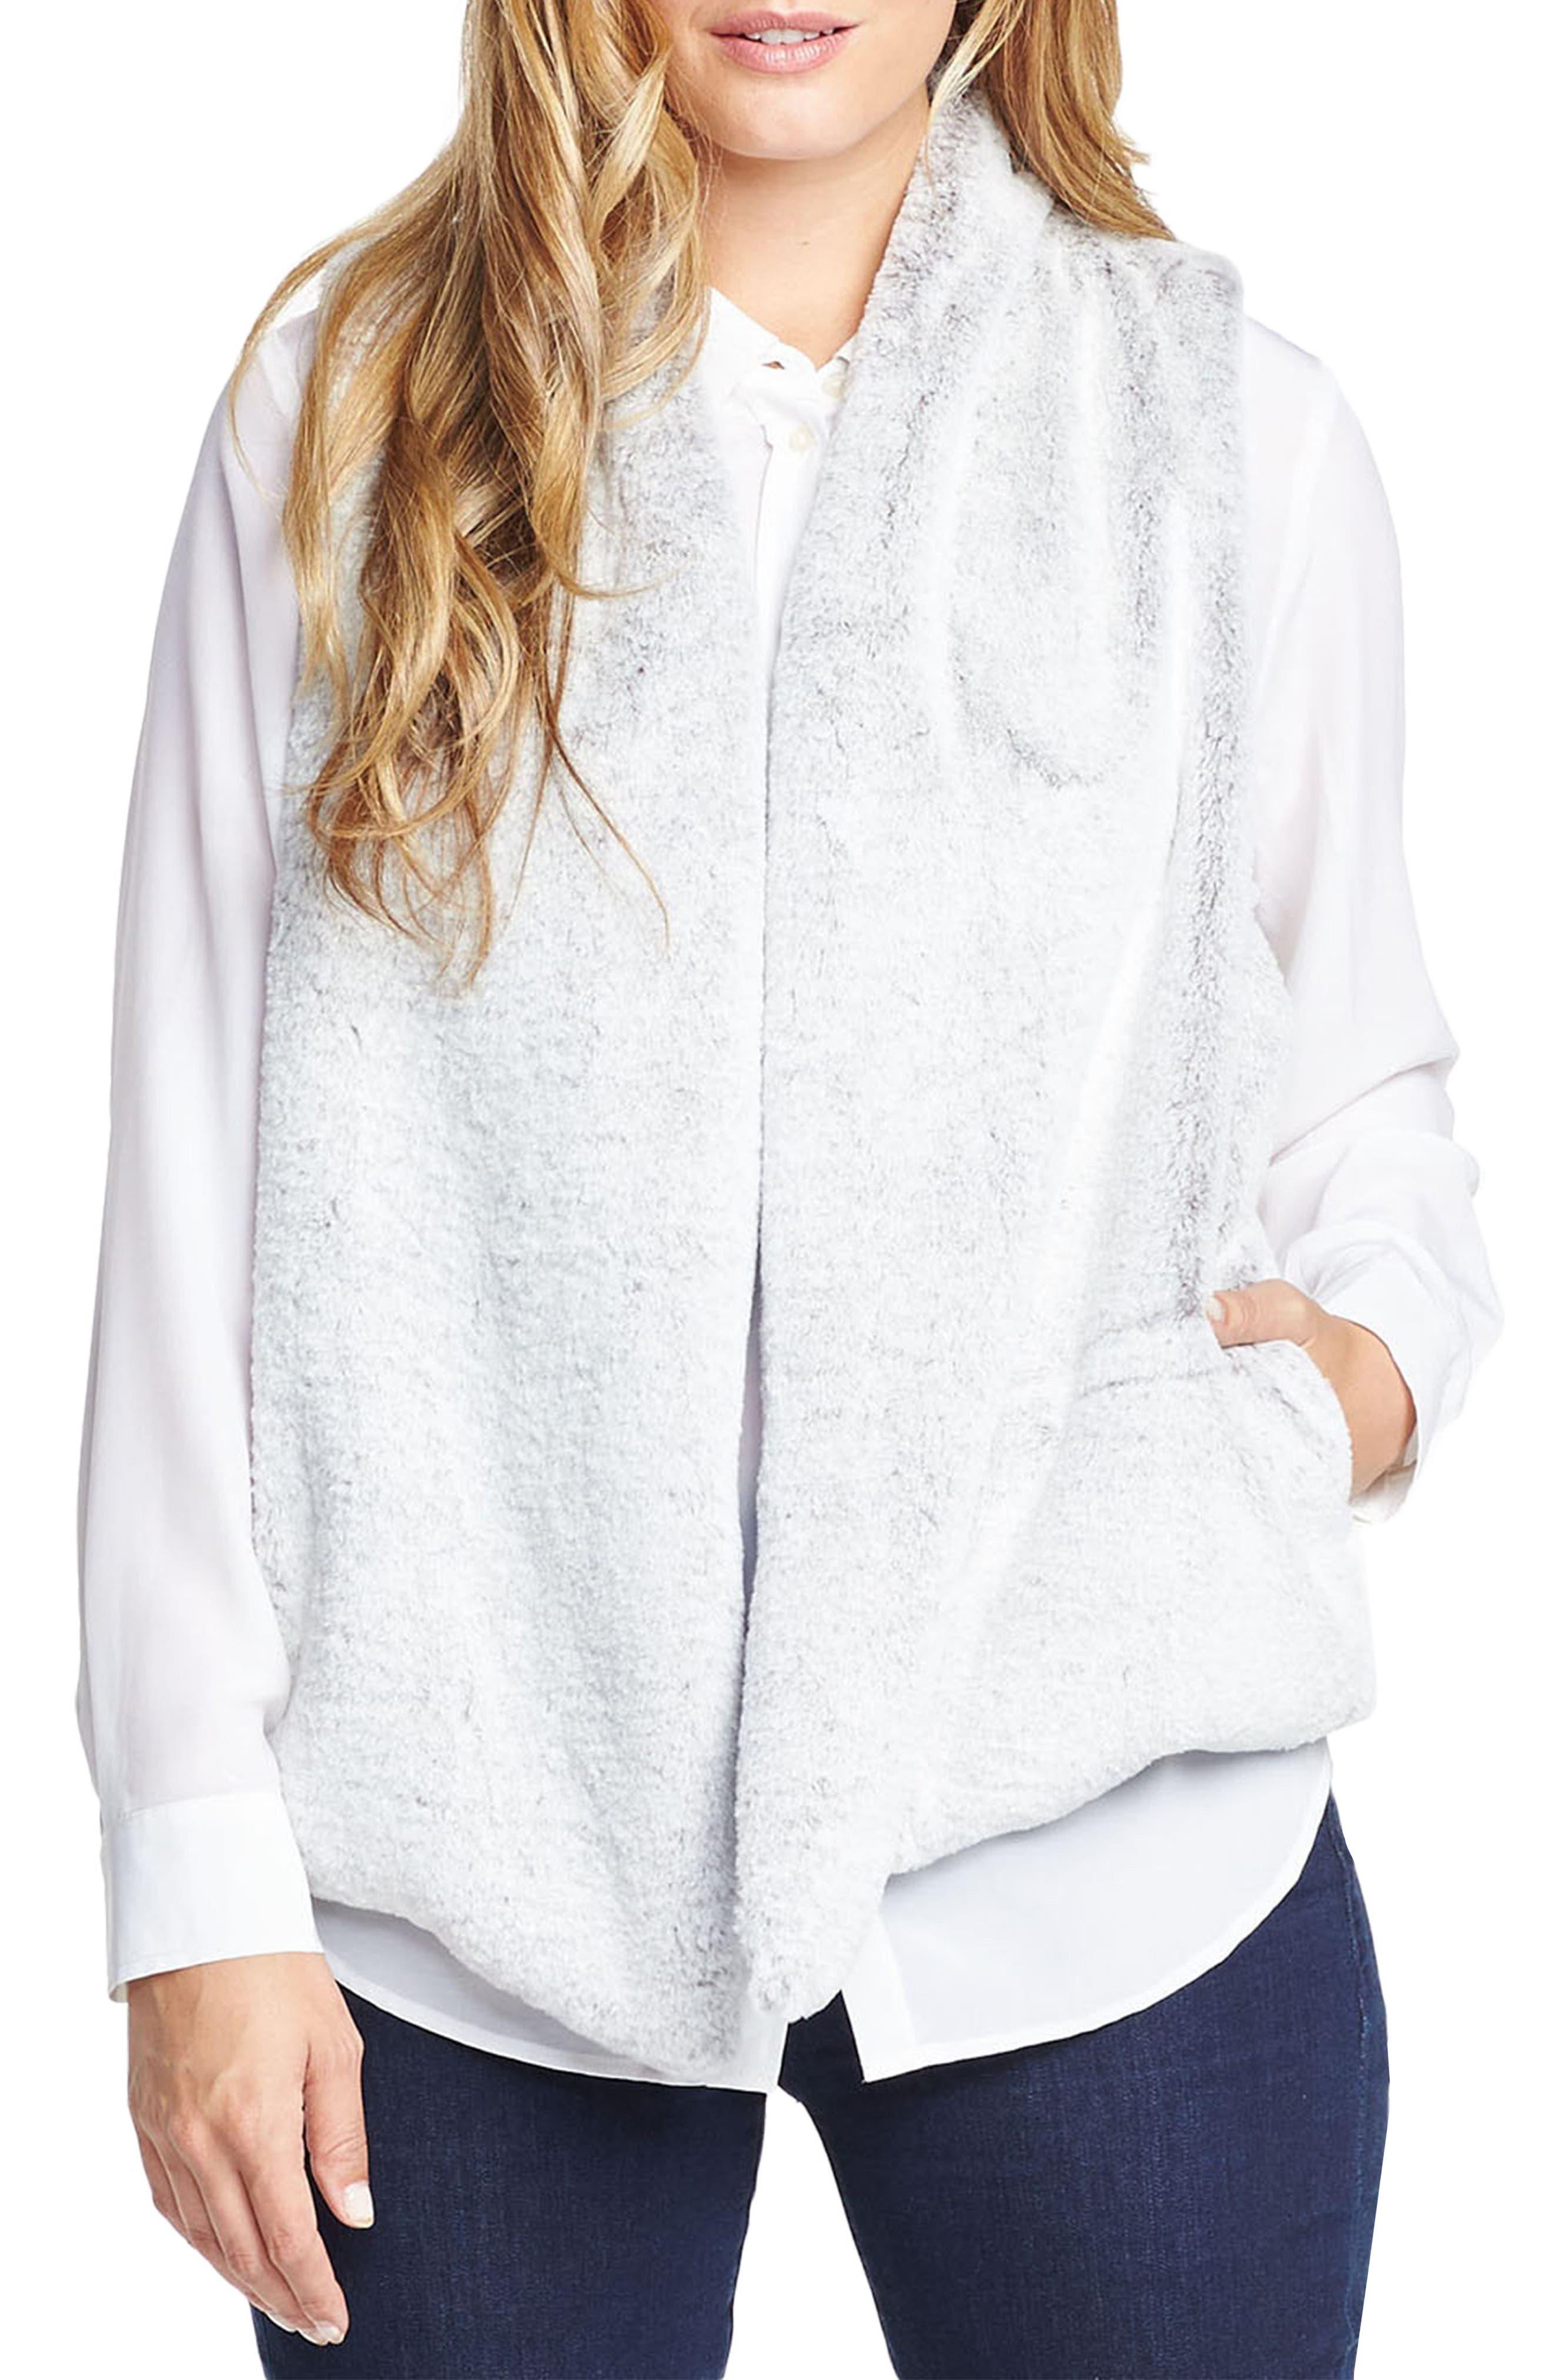 Alternate Image 1 Selected - Tart 'Kya' Faux Fur Vest (Plus Size)